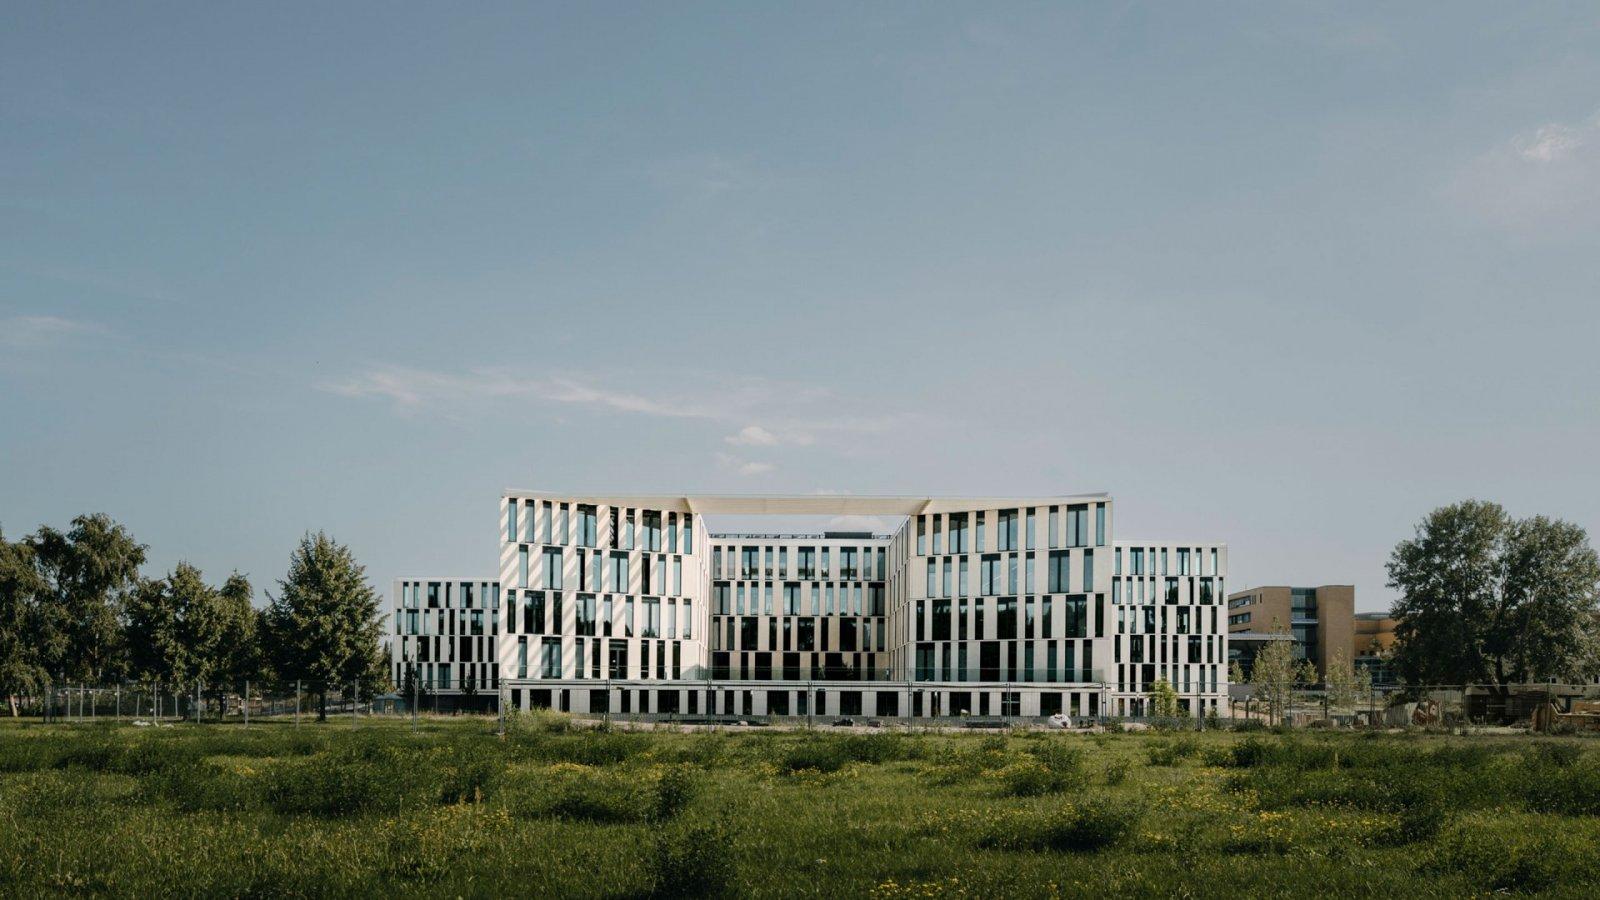 ILB Investitionsbank Brandenburg